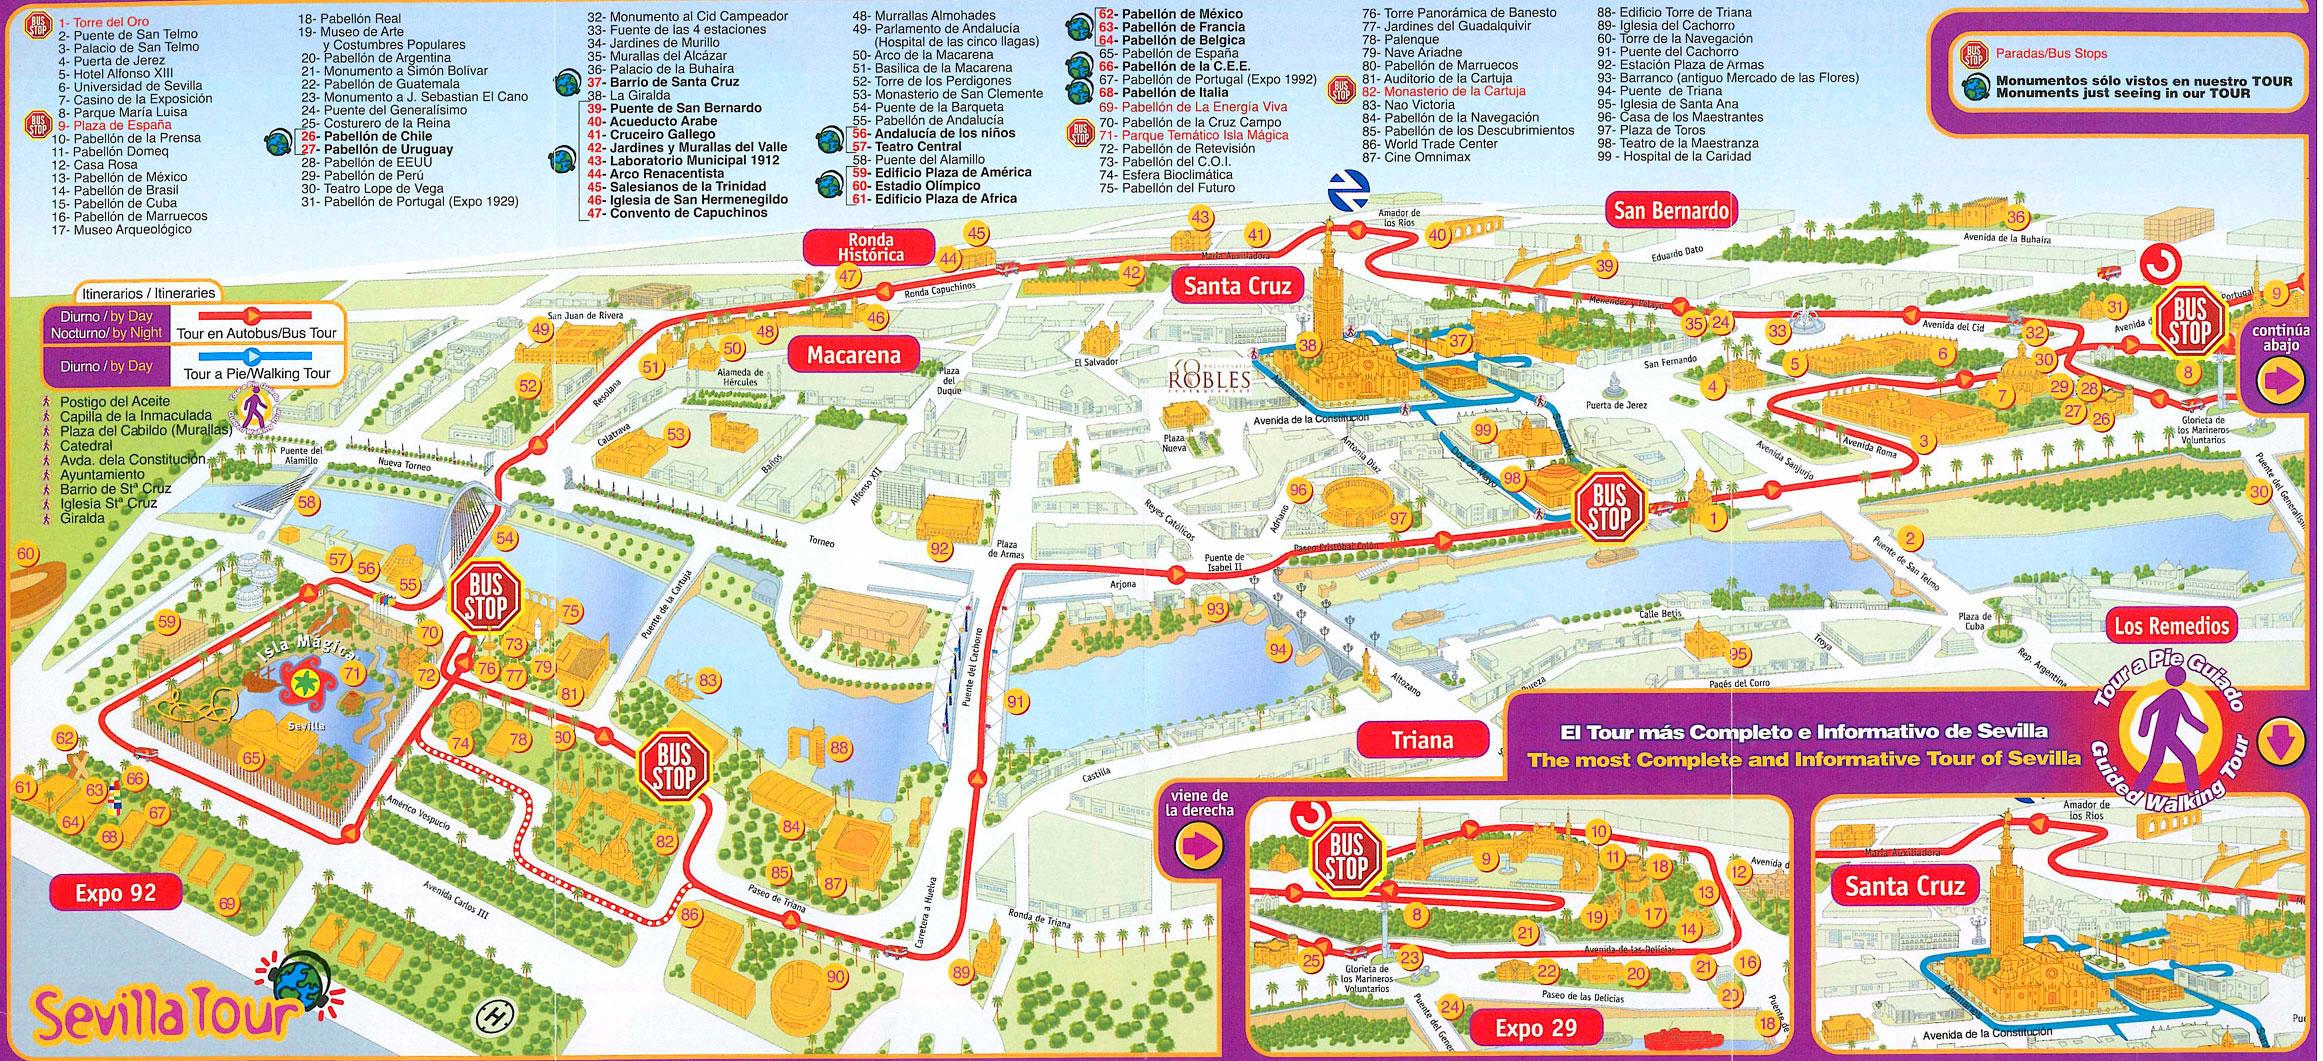 mapa-turismo-sevilha